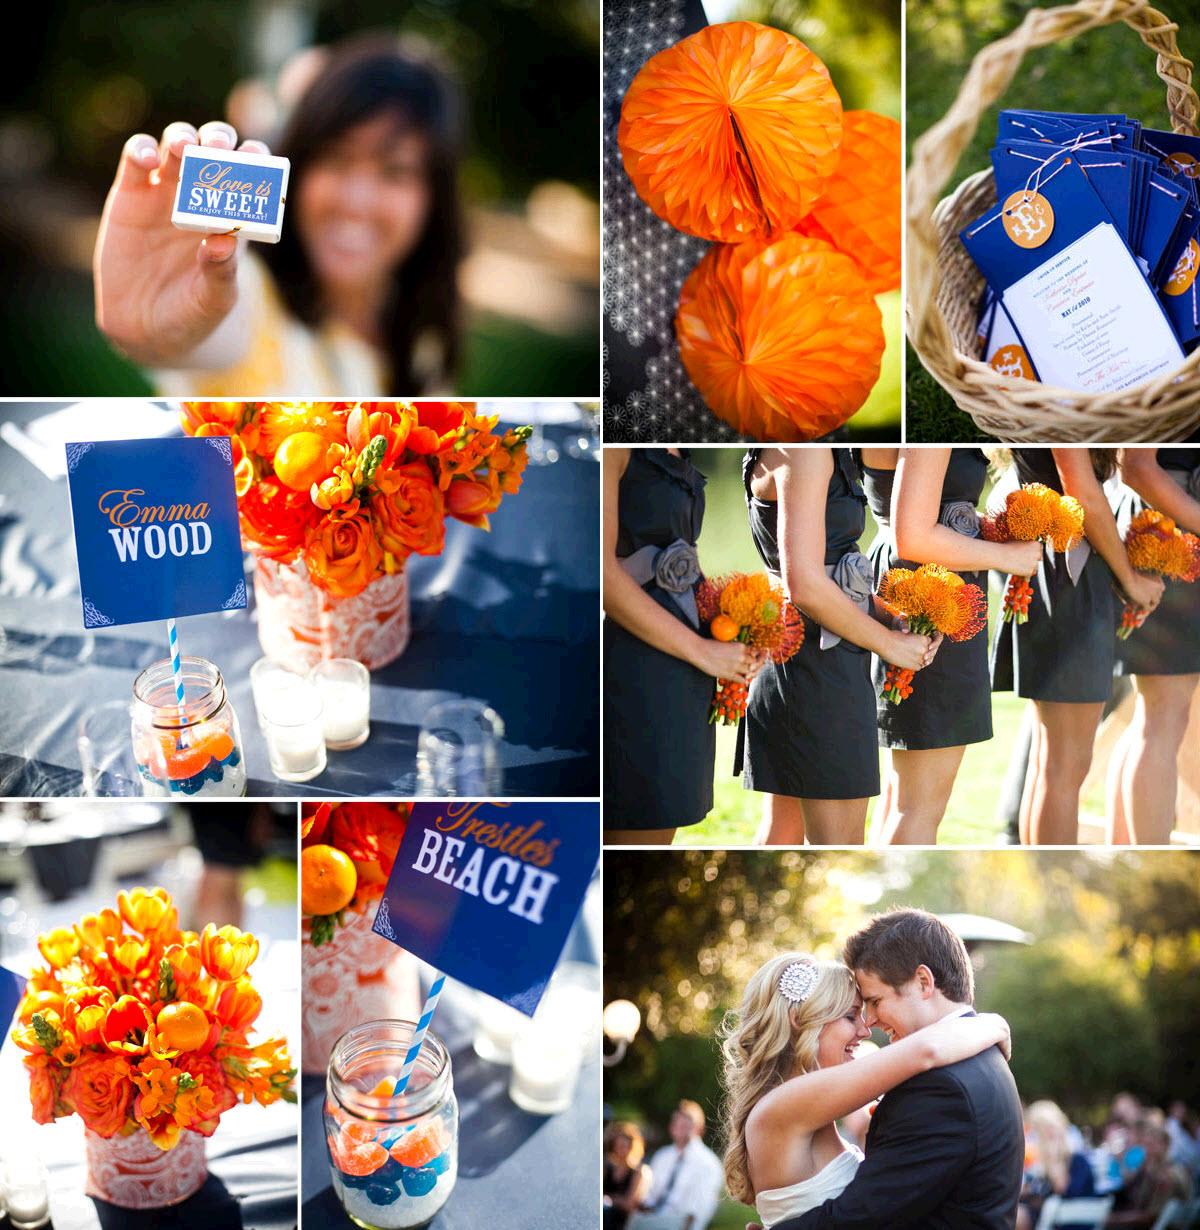 Wedding Decorations Blue And Orange : Pics photos navy blue and orange wedding decor